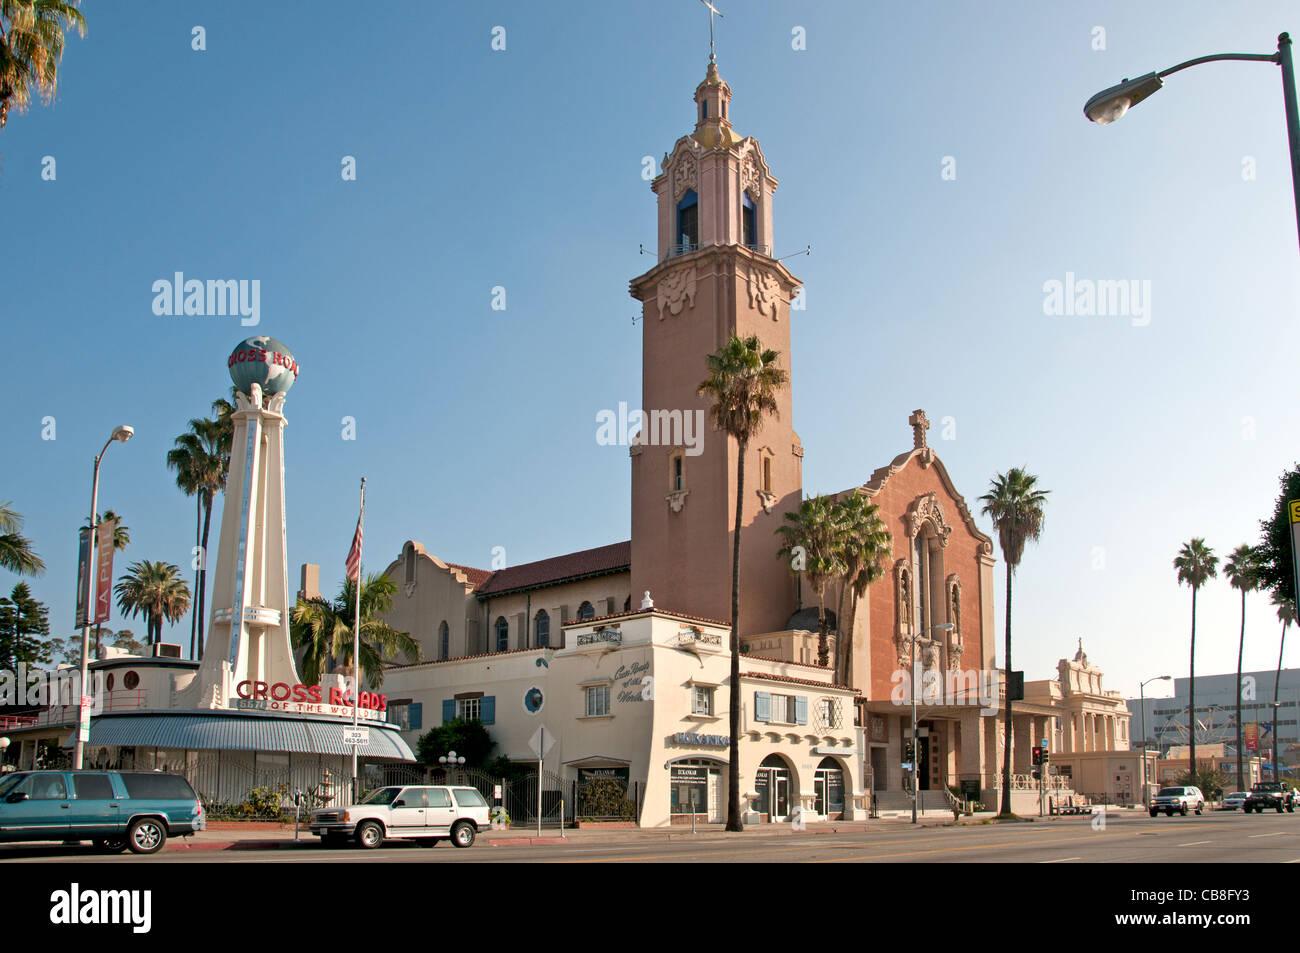 Sunset Boulevard  Beverly Hills Los Angeles United States - Stock Image